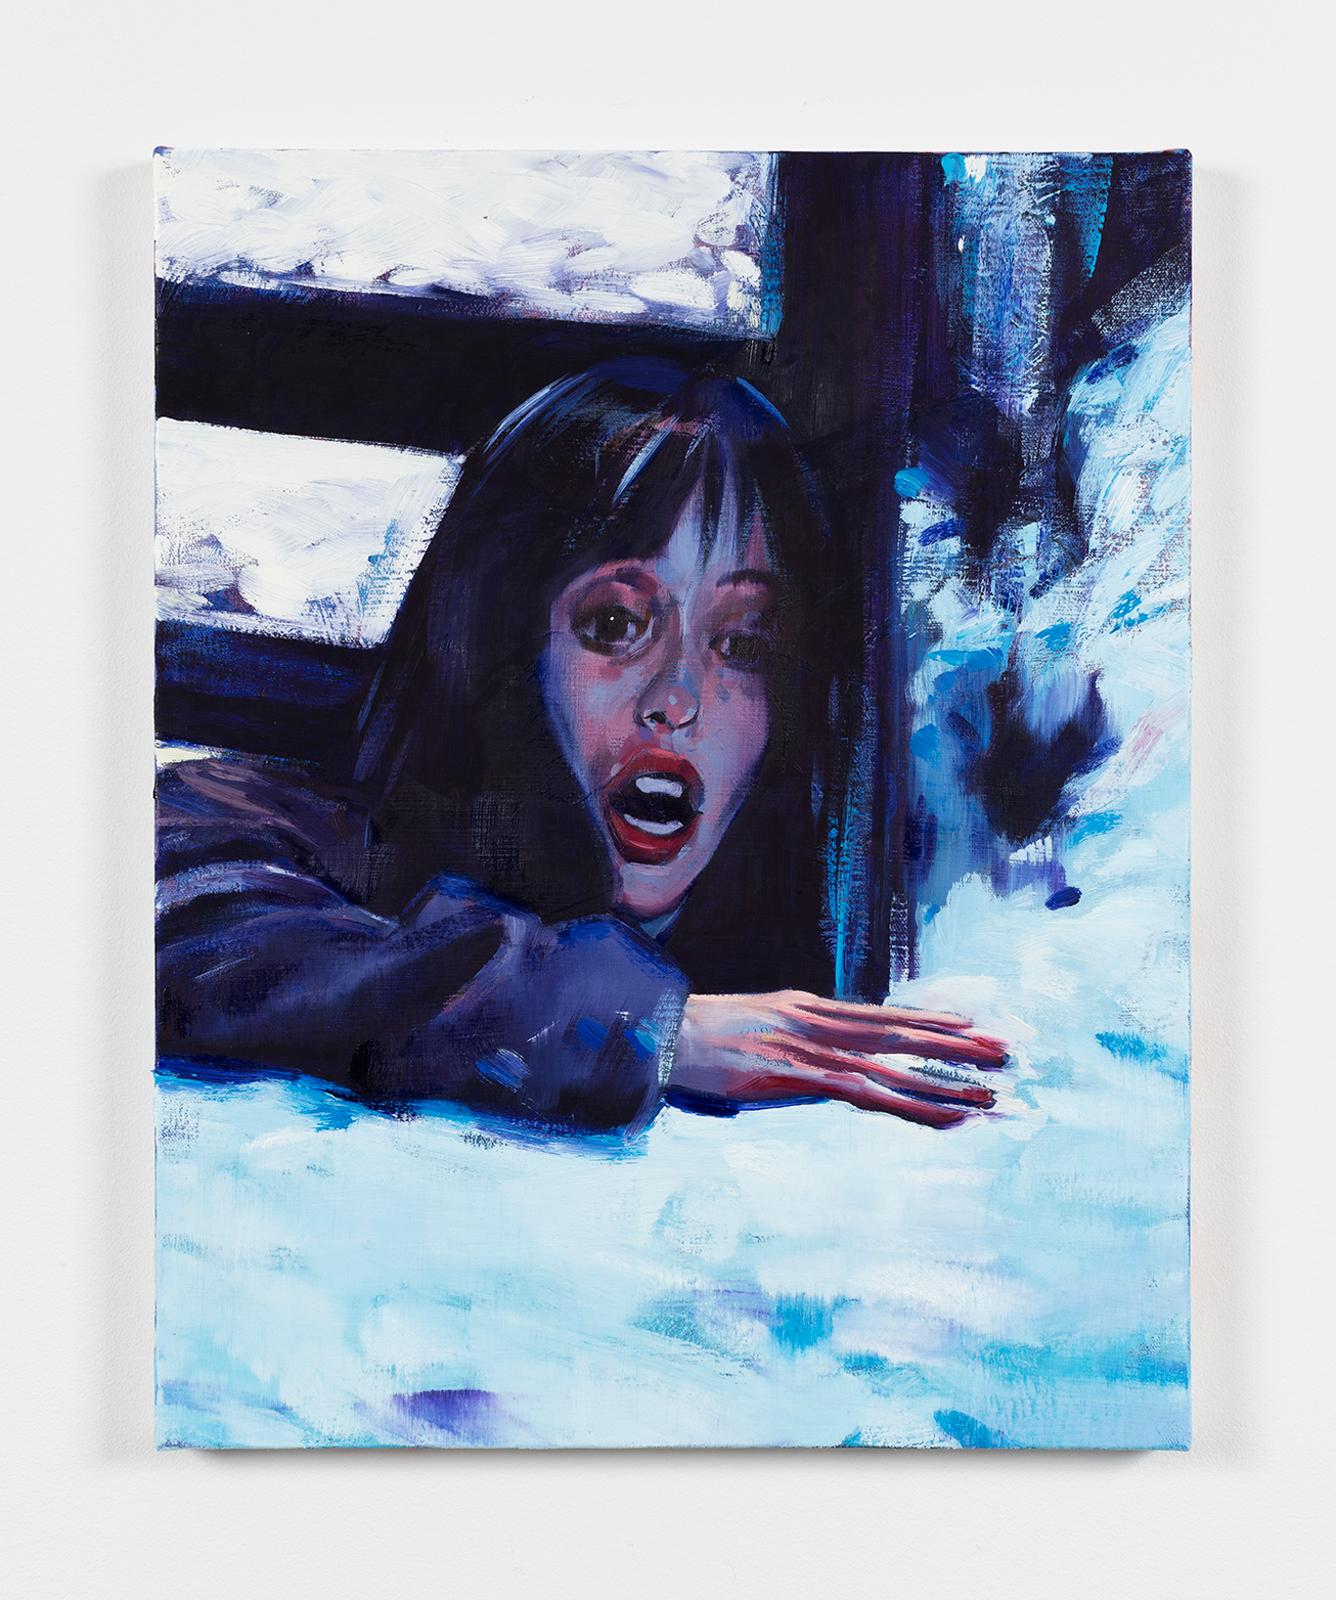 Sam McKinniss, Wendy, 2016. Oil and acrylic on canvas, 51 x 41 cm © Sam McKinniss, courtesy team (gallery, inc.)